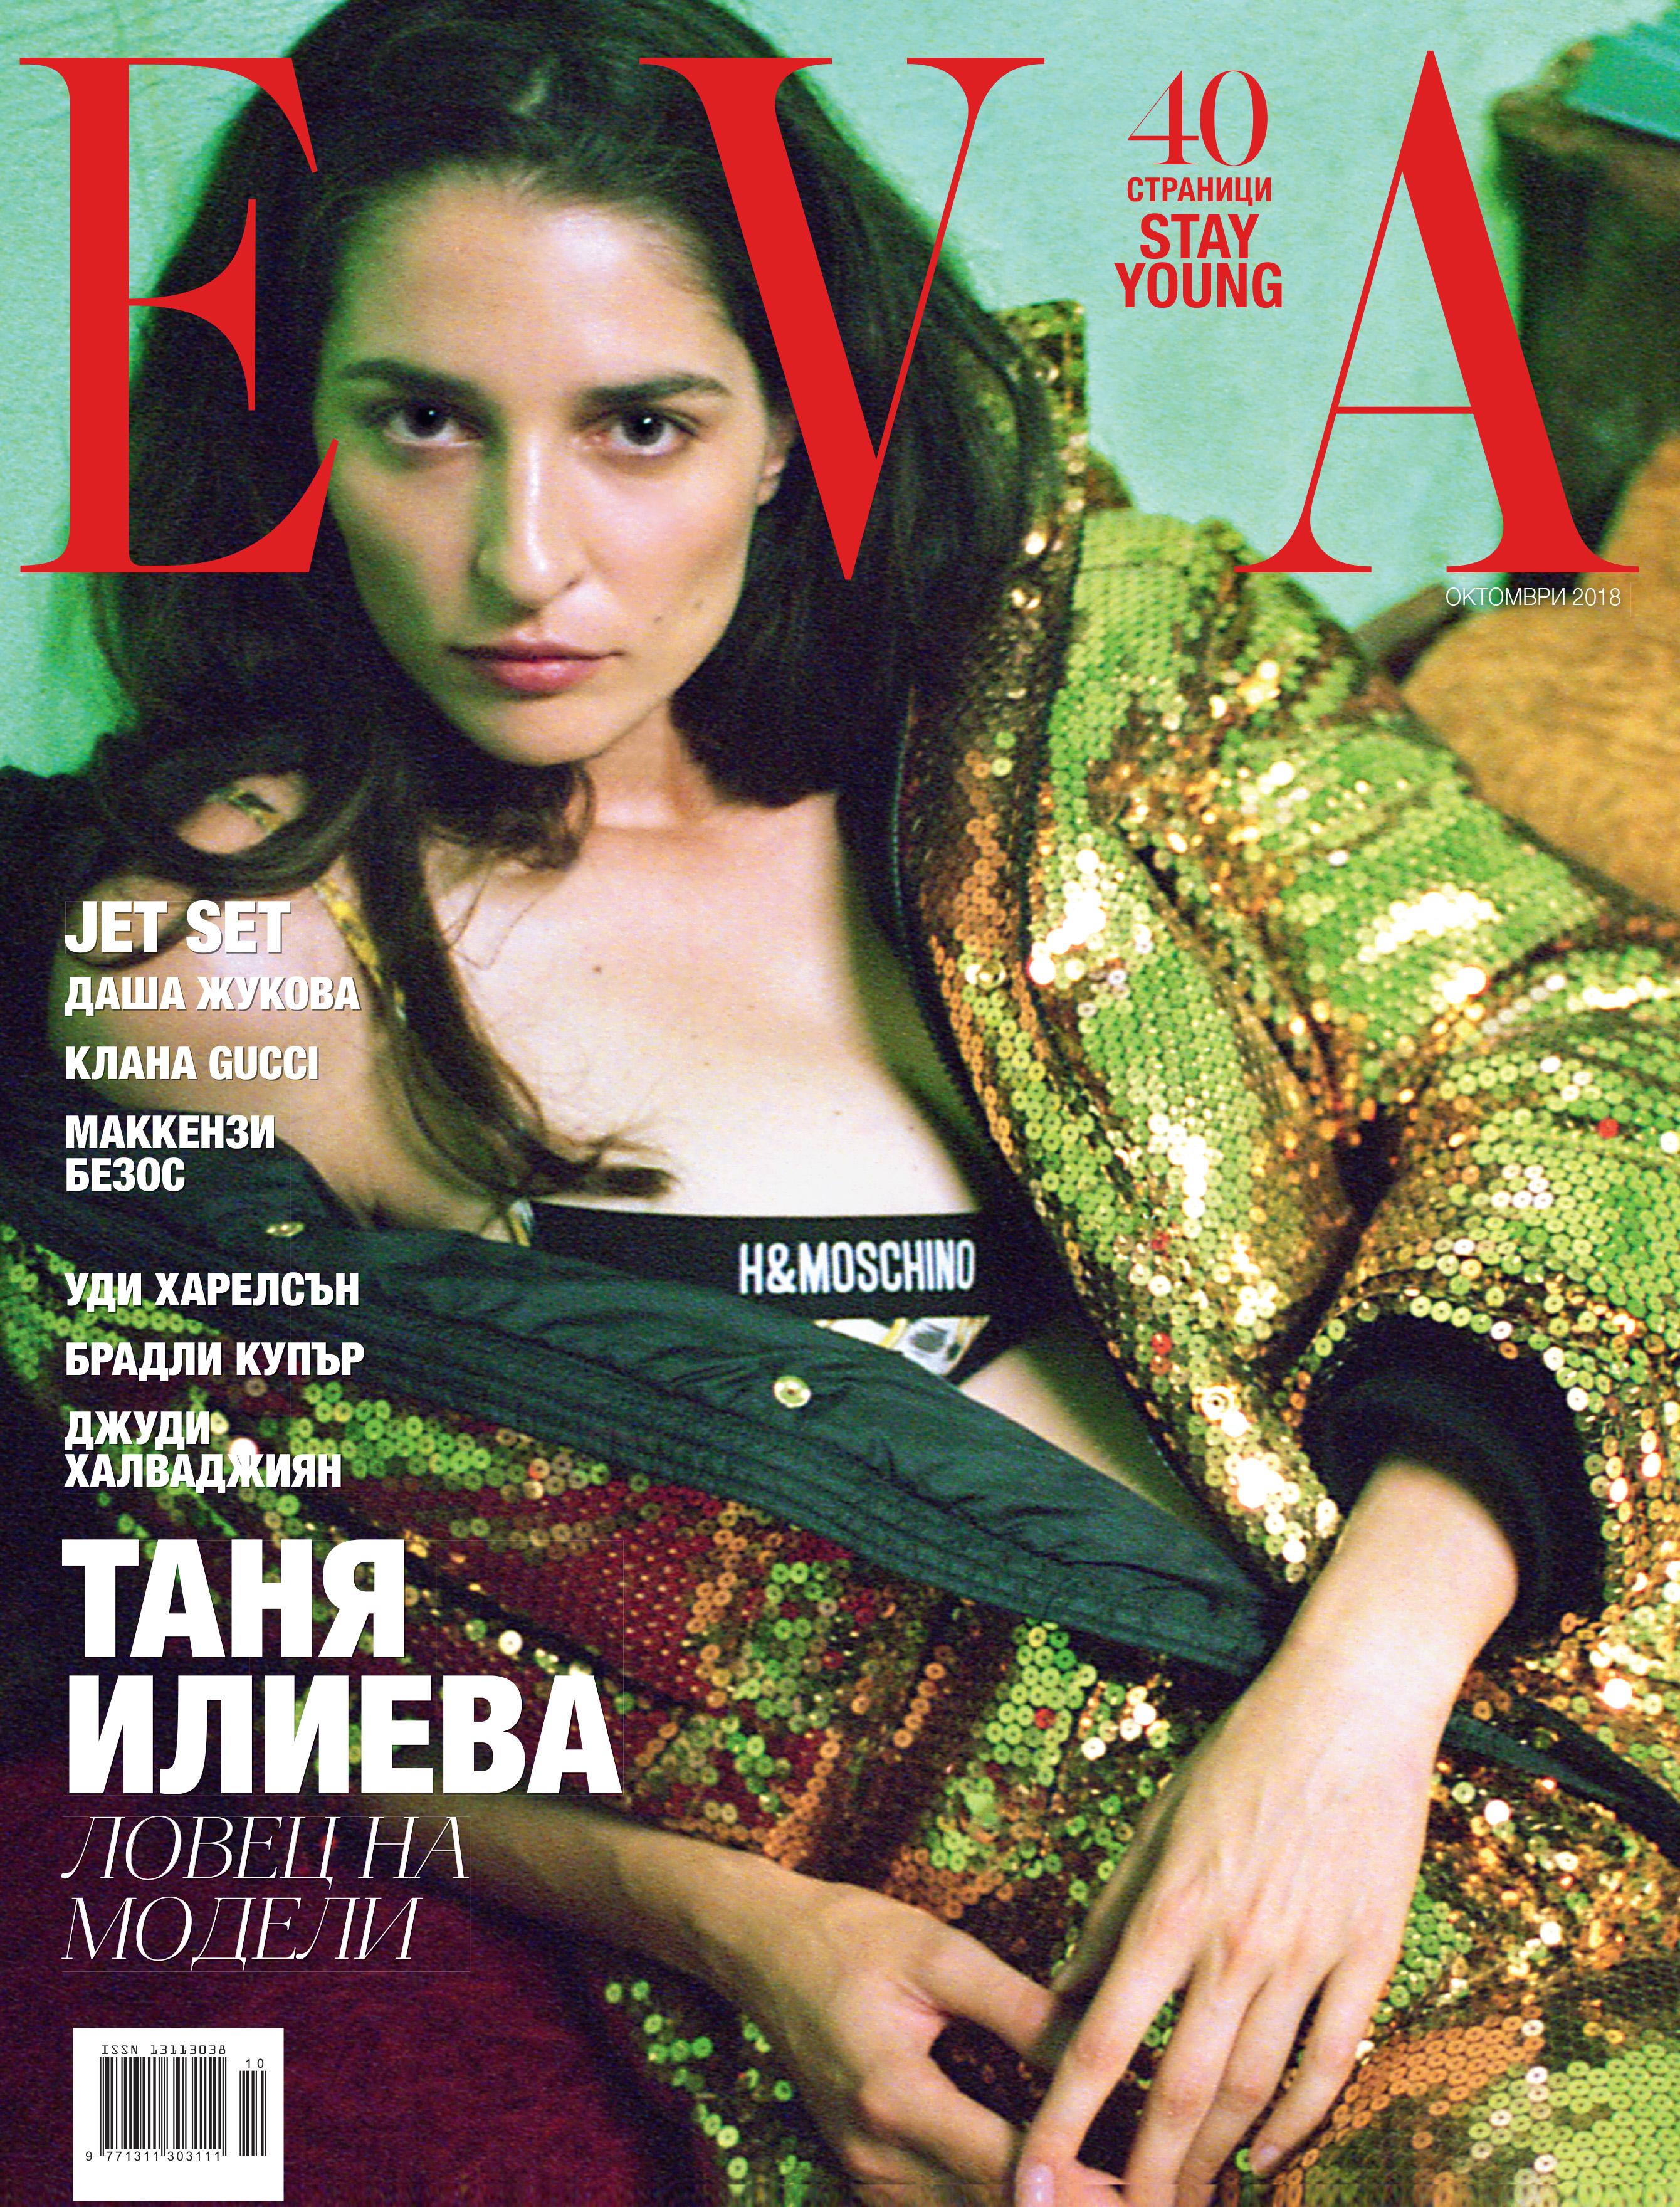 Tanya Ilieva Nude Photos 31